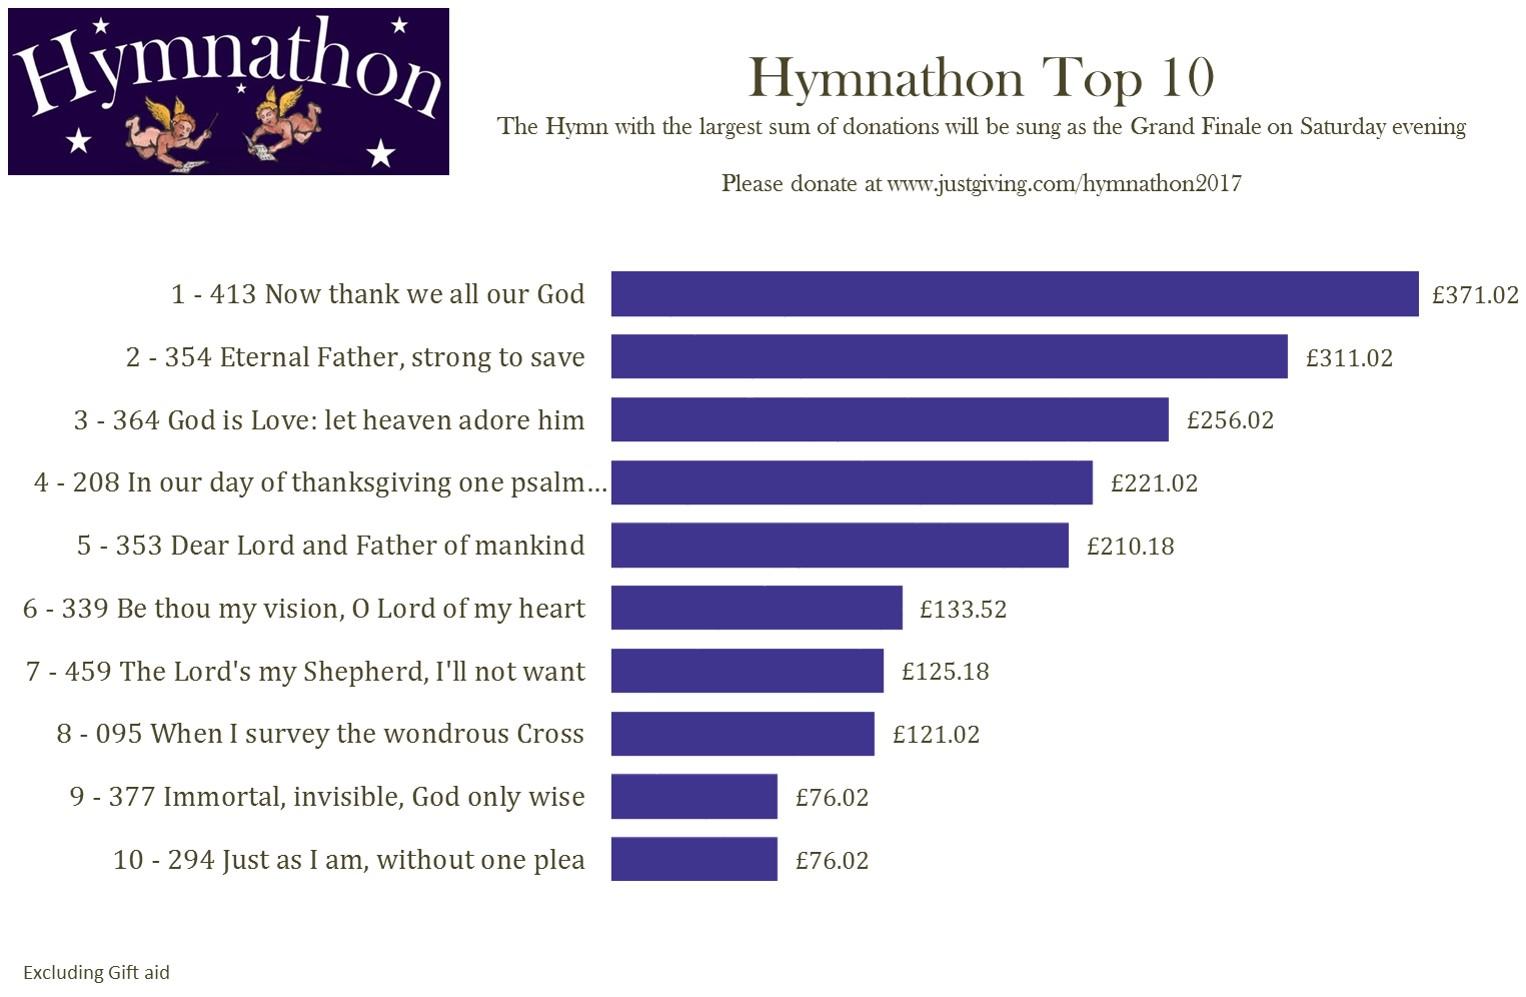 Top 10 26th Feb